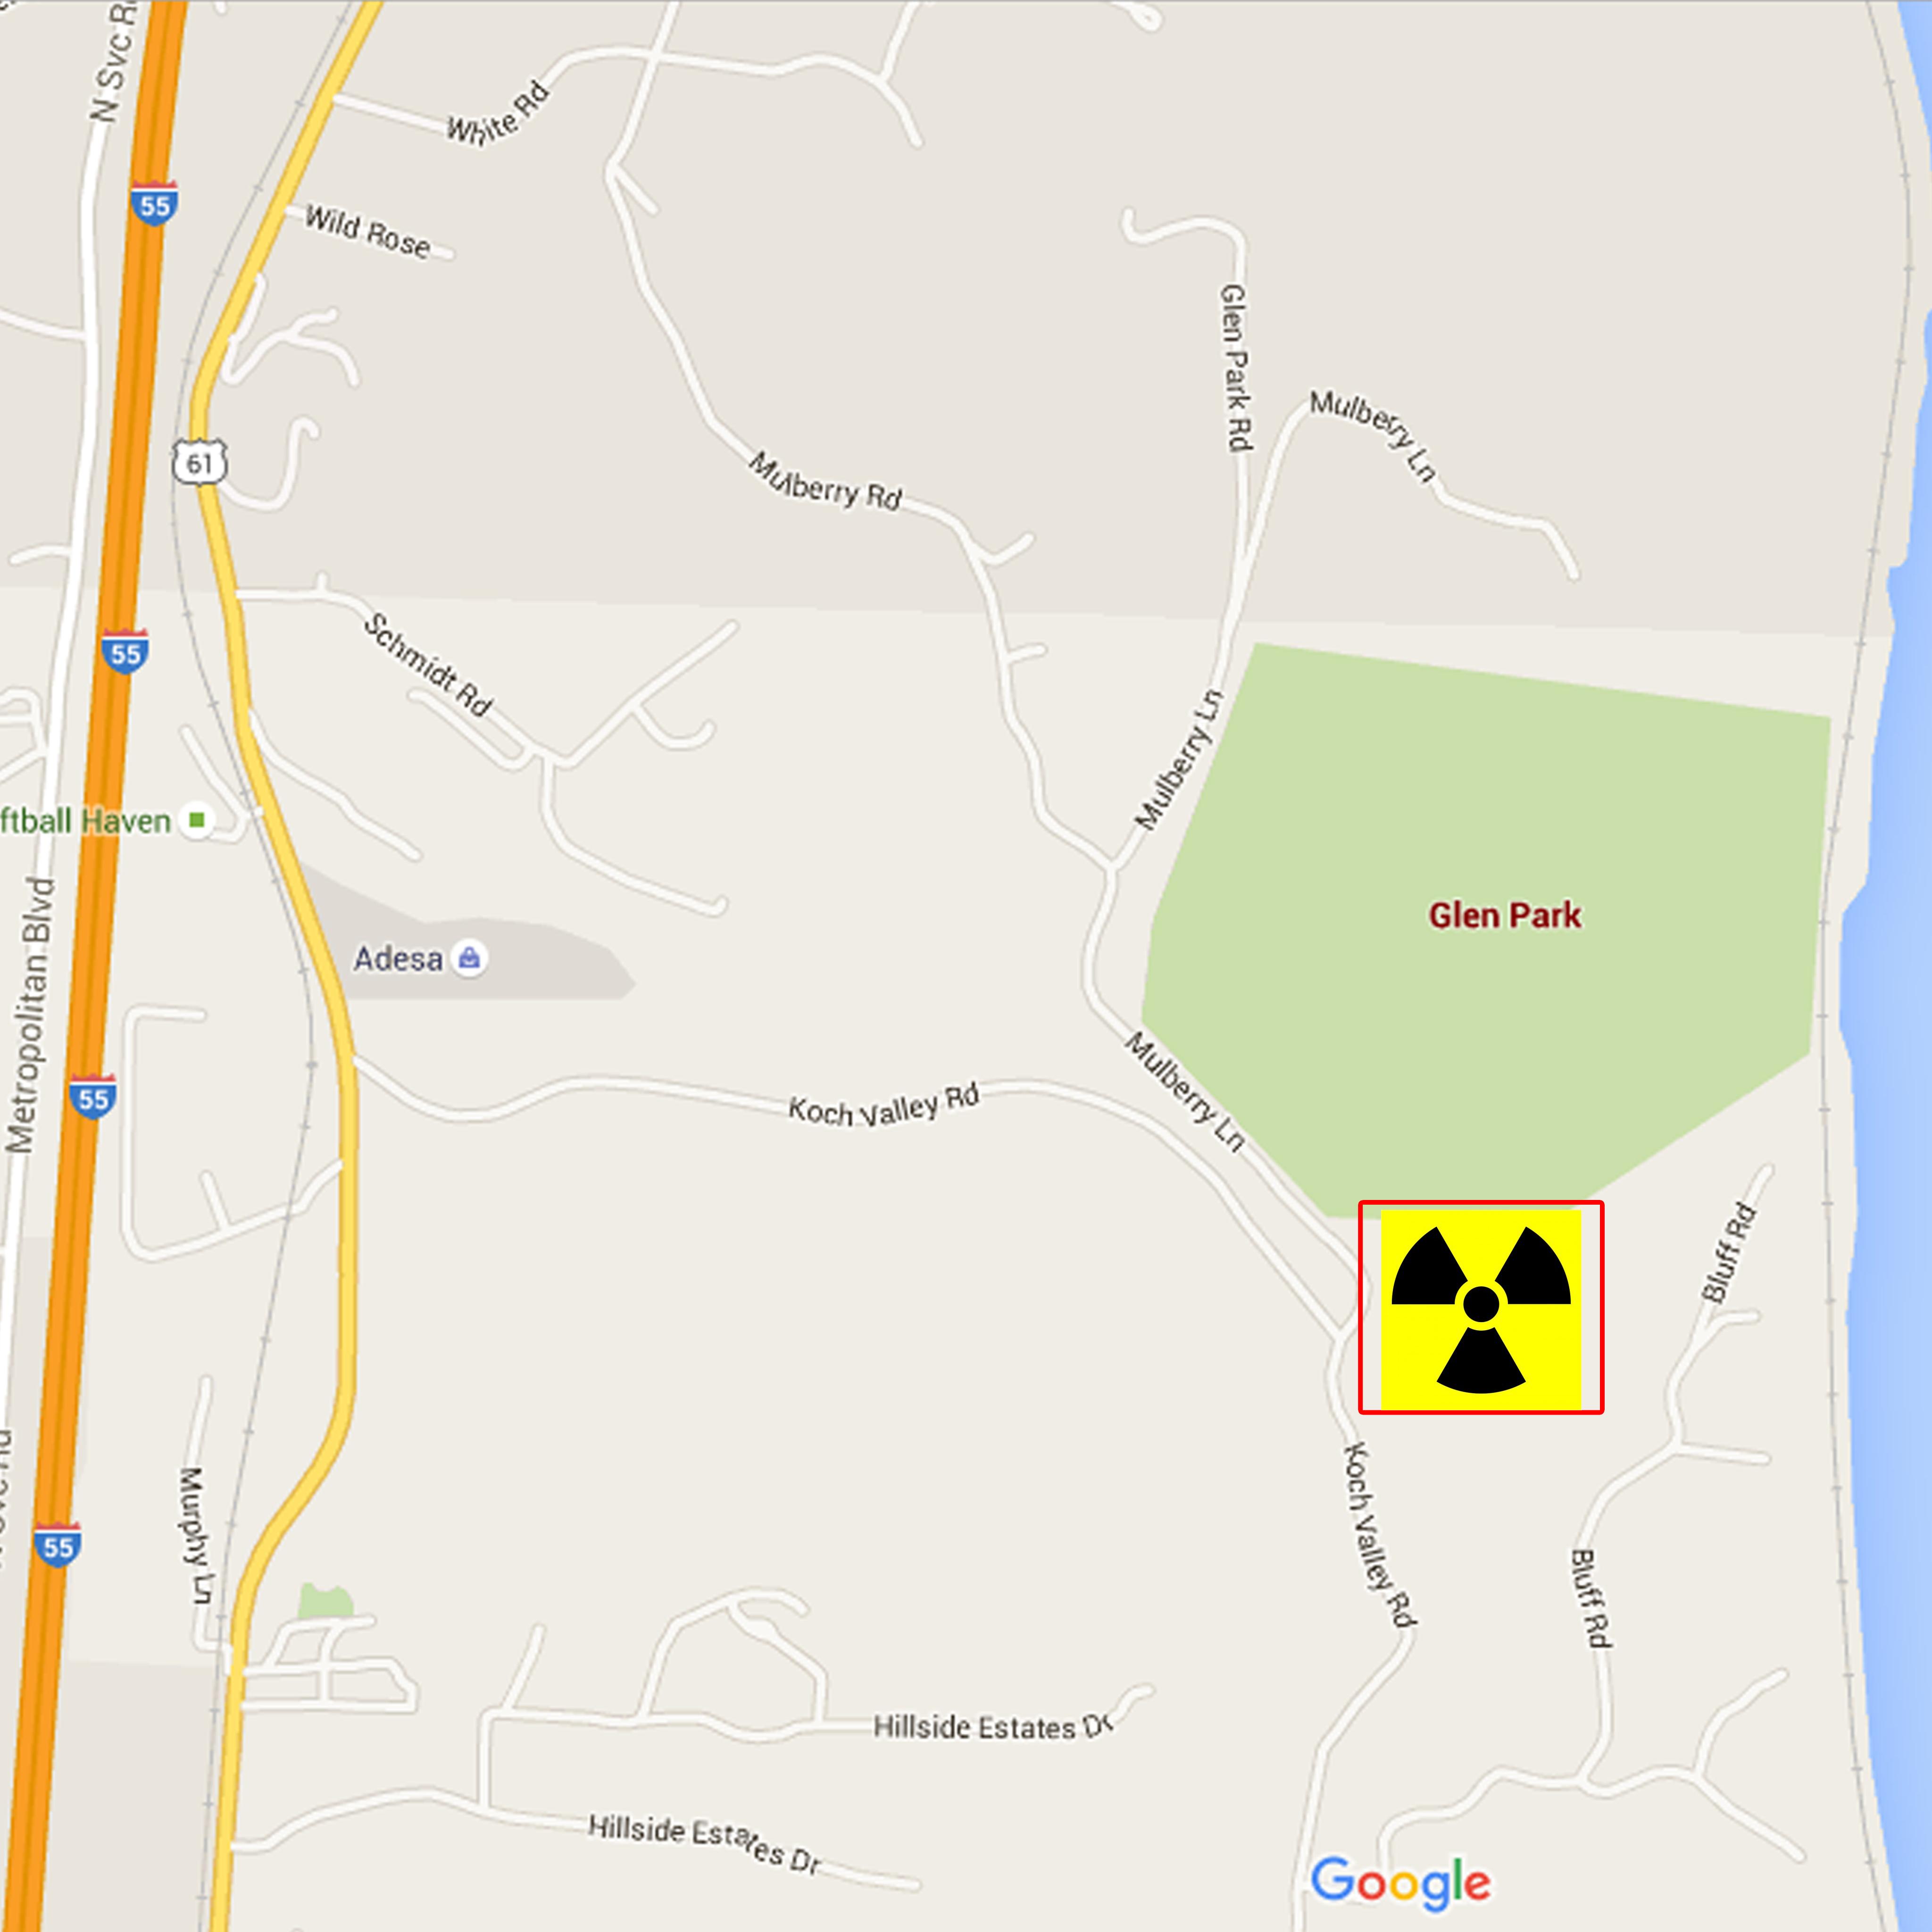 Contamination_site.jpg